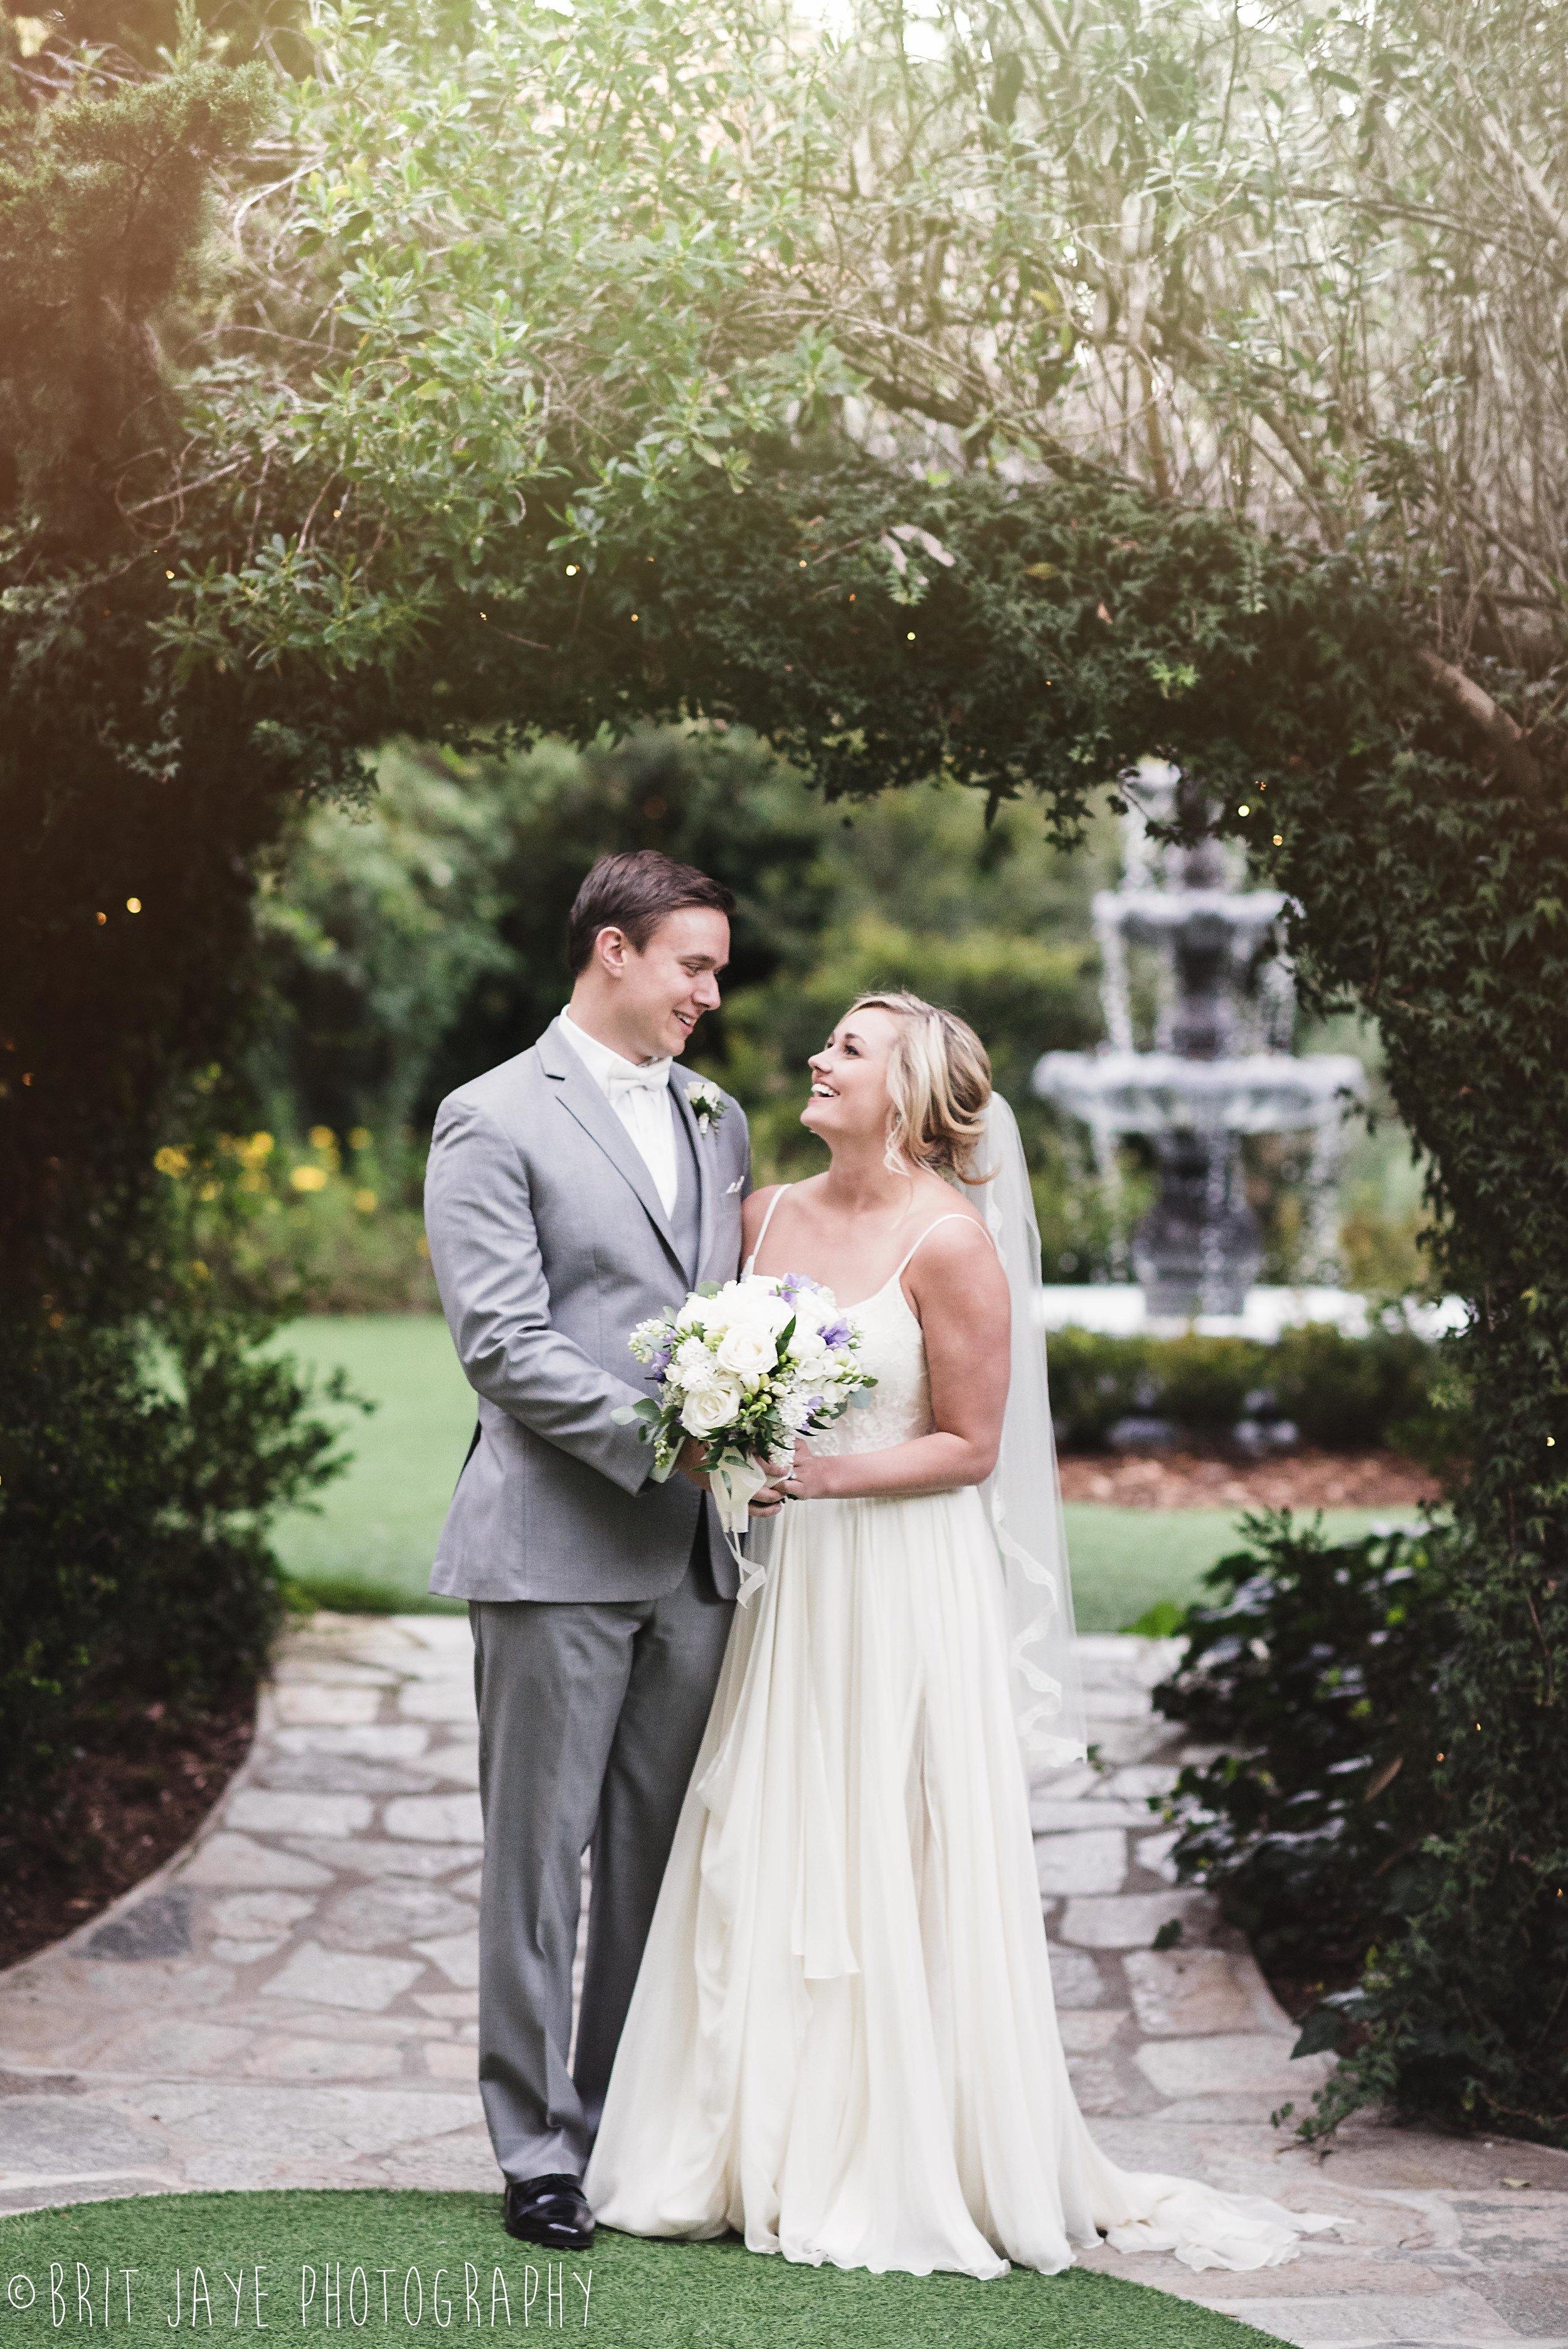 Twin_Oaks_House_and_Garden_Wedding_-1-4.jpg